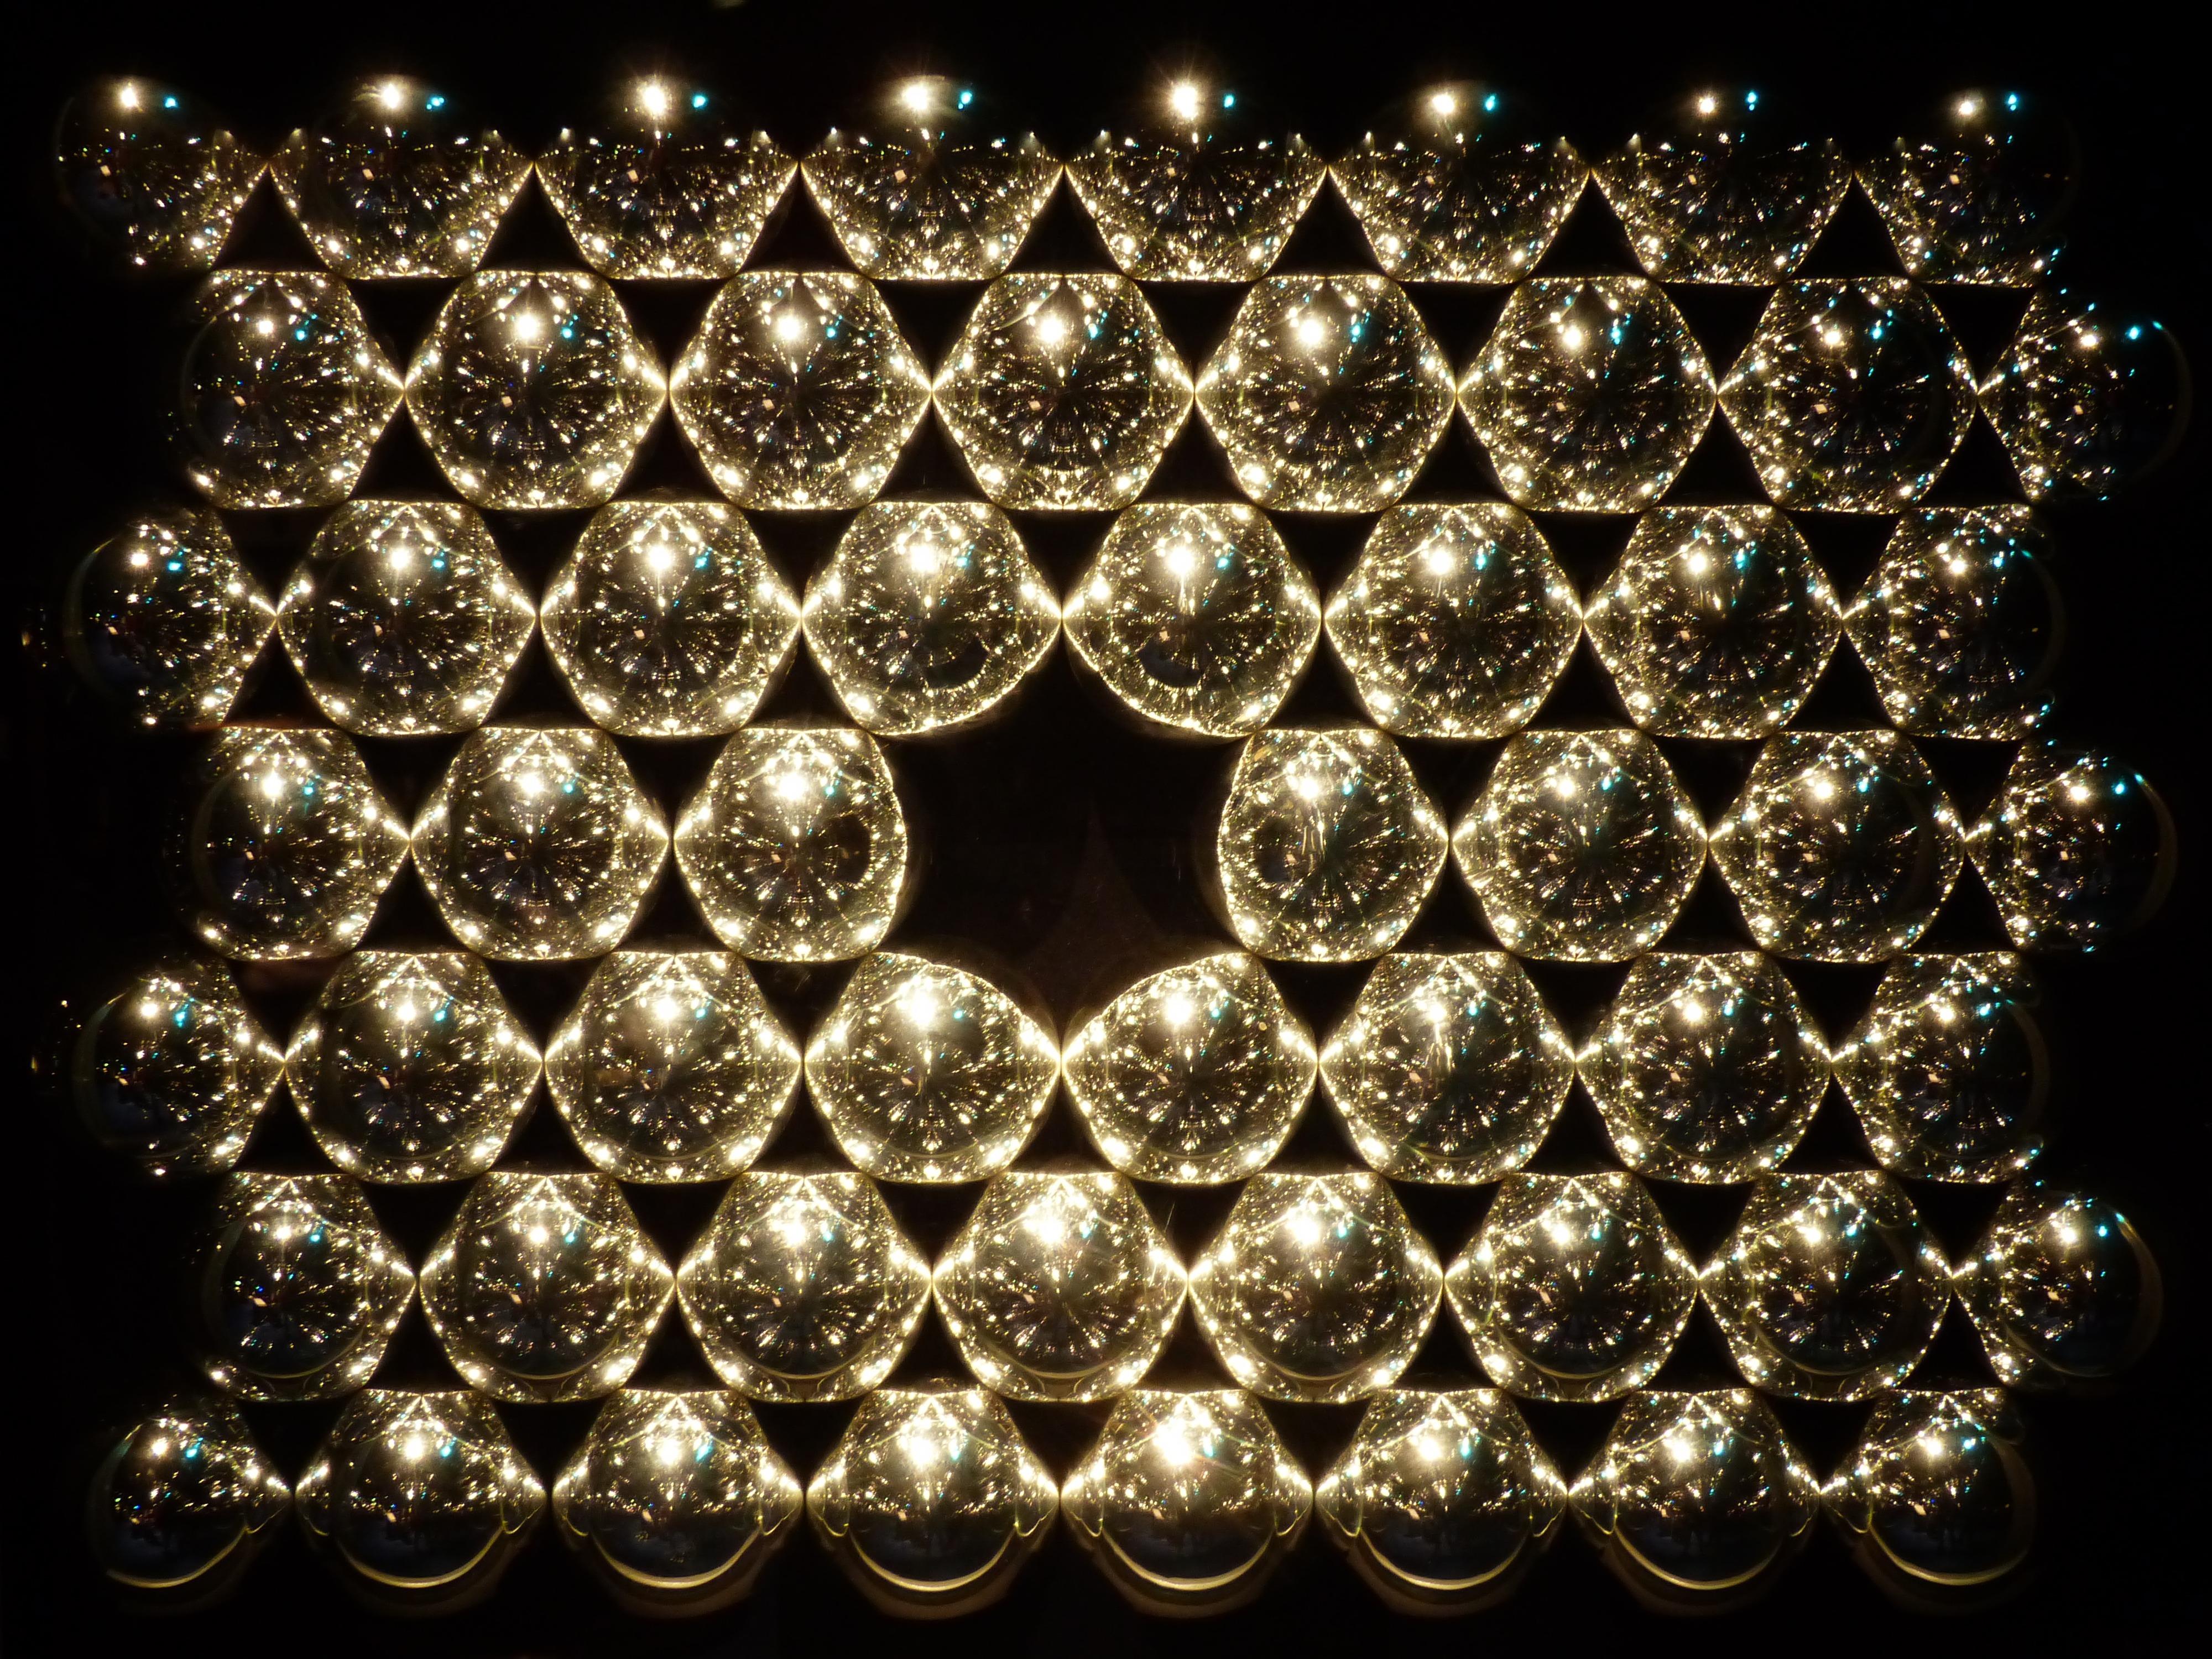 Free chain refraction pattern reflection shine metal